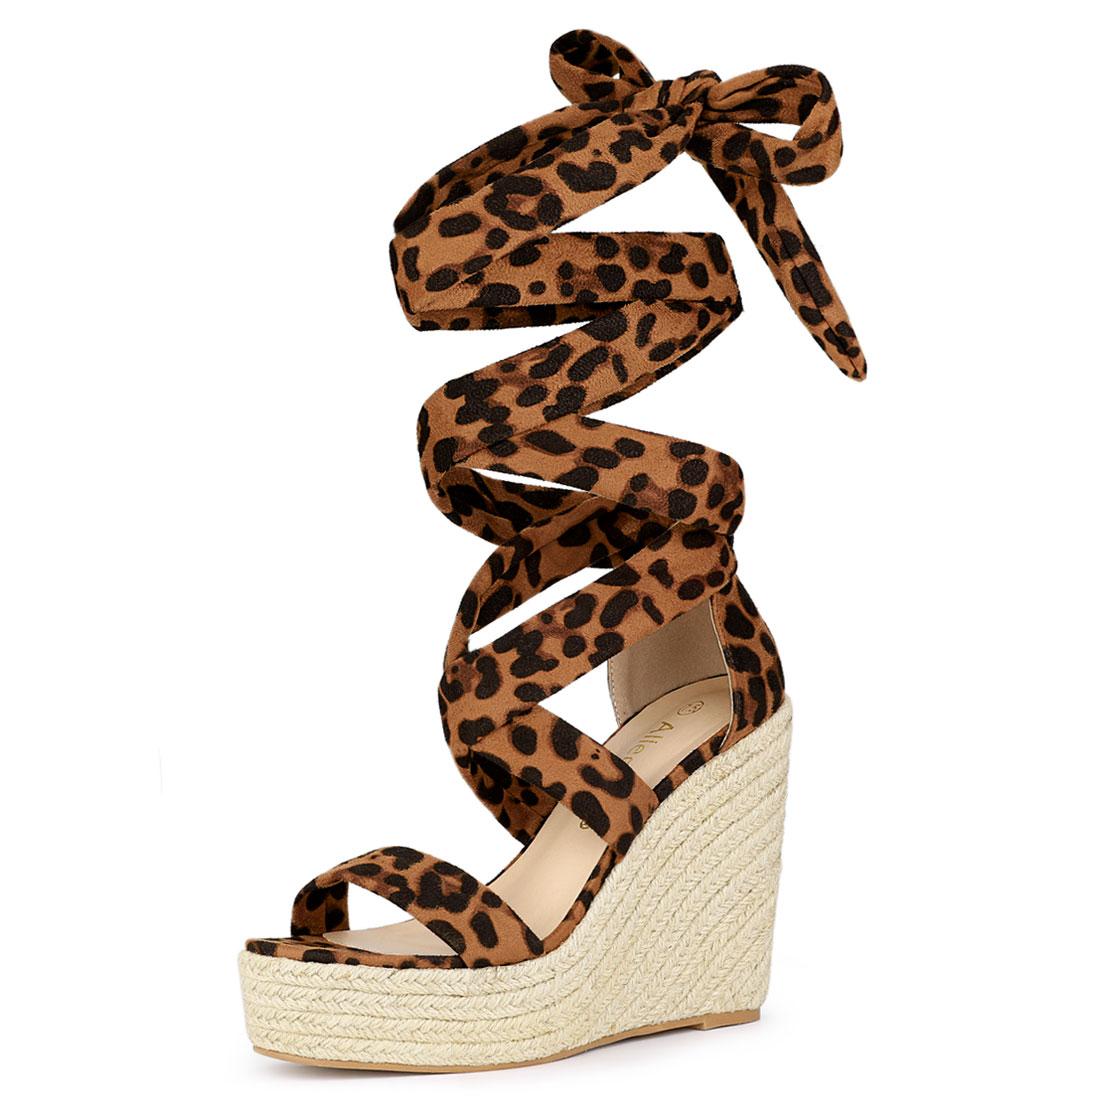 Allegra K Women's Espadrille Platform Wedges Heel Lace Up Sandals Leopard US 6